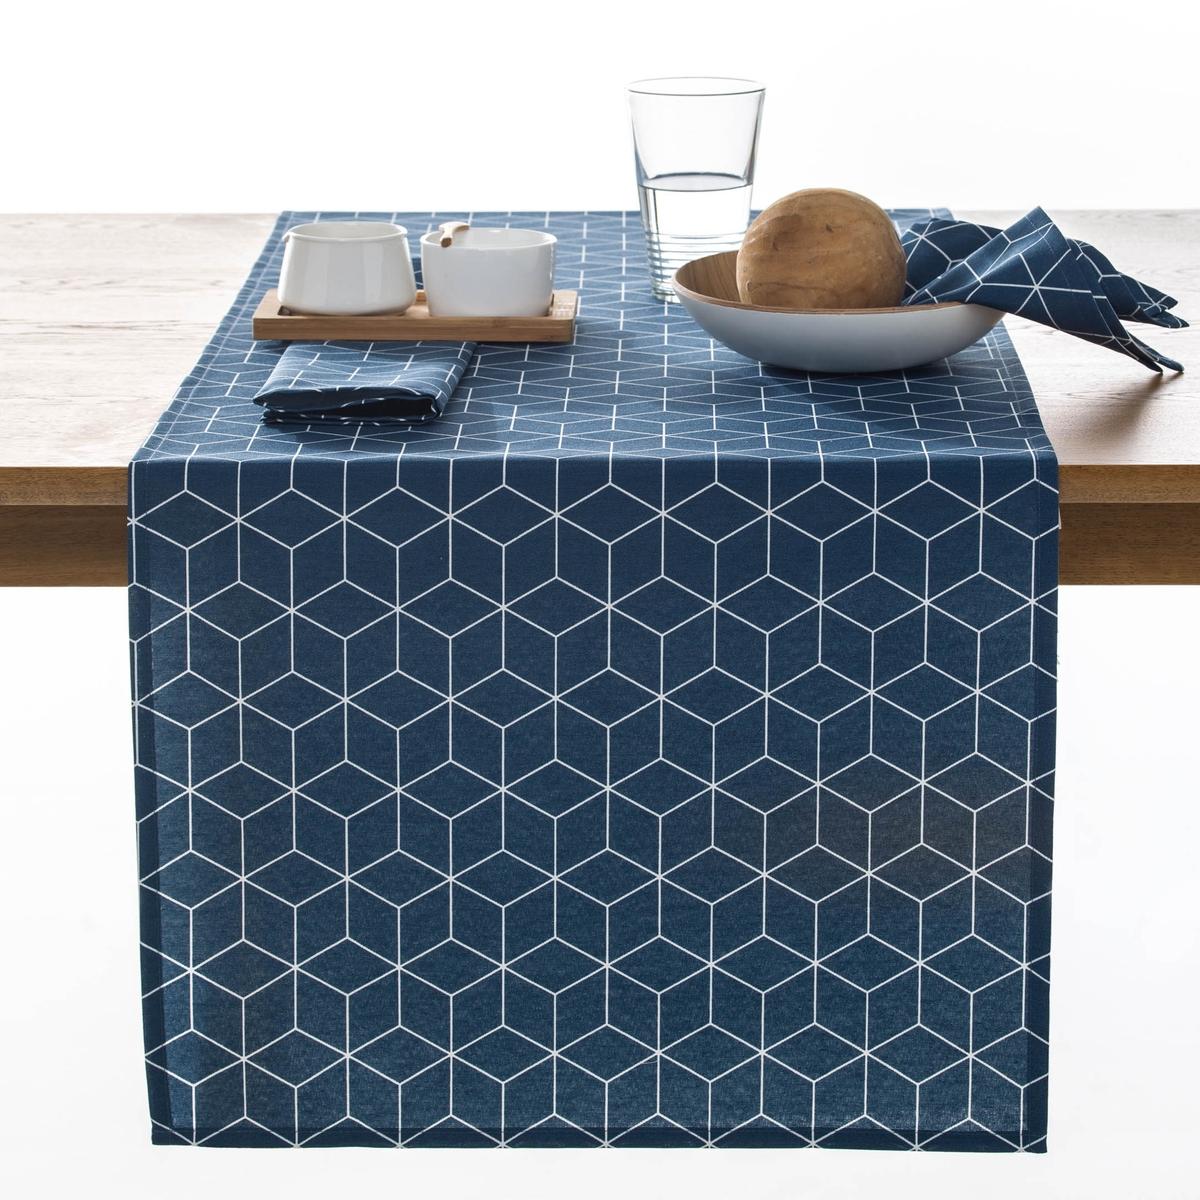 Дорожка La Redoute Столовая DIAMOND 50 x 150 см синий наволочка la redoute flooch 50 x 30 см бежевый